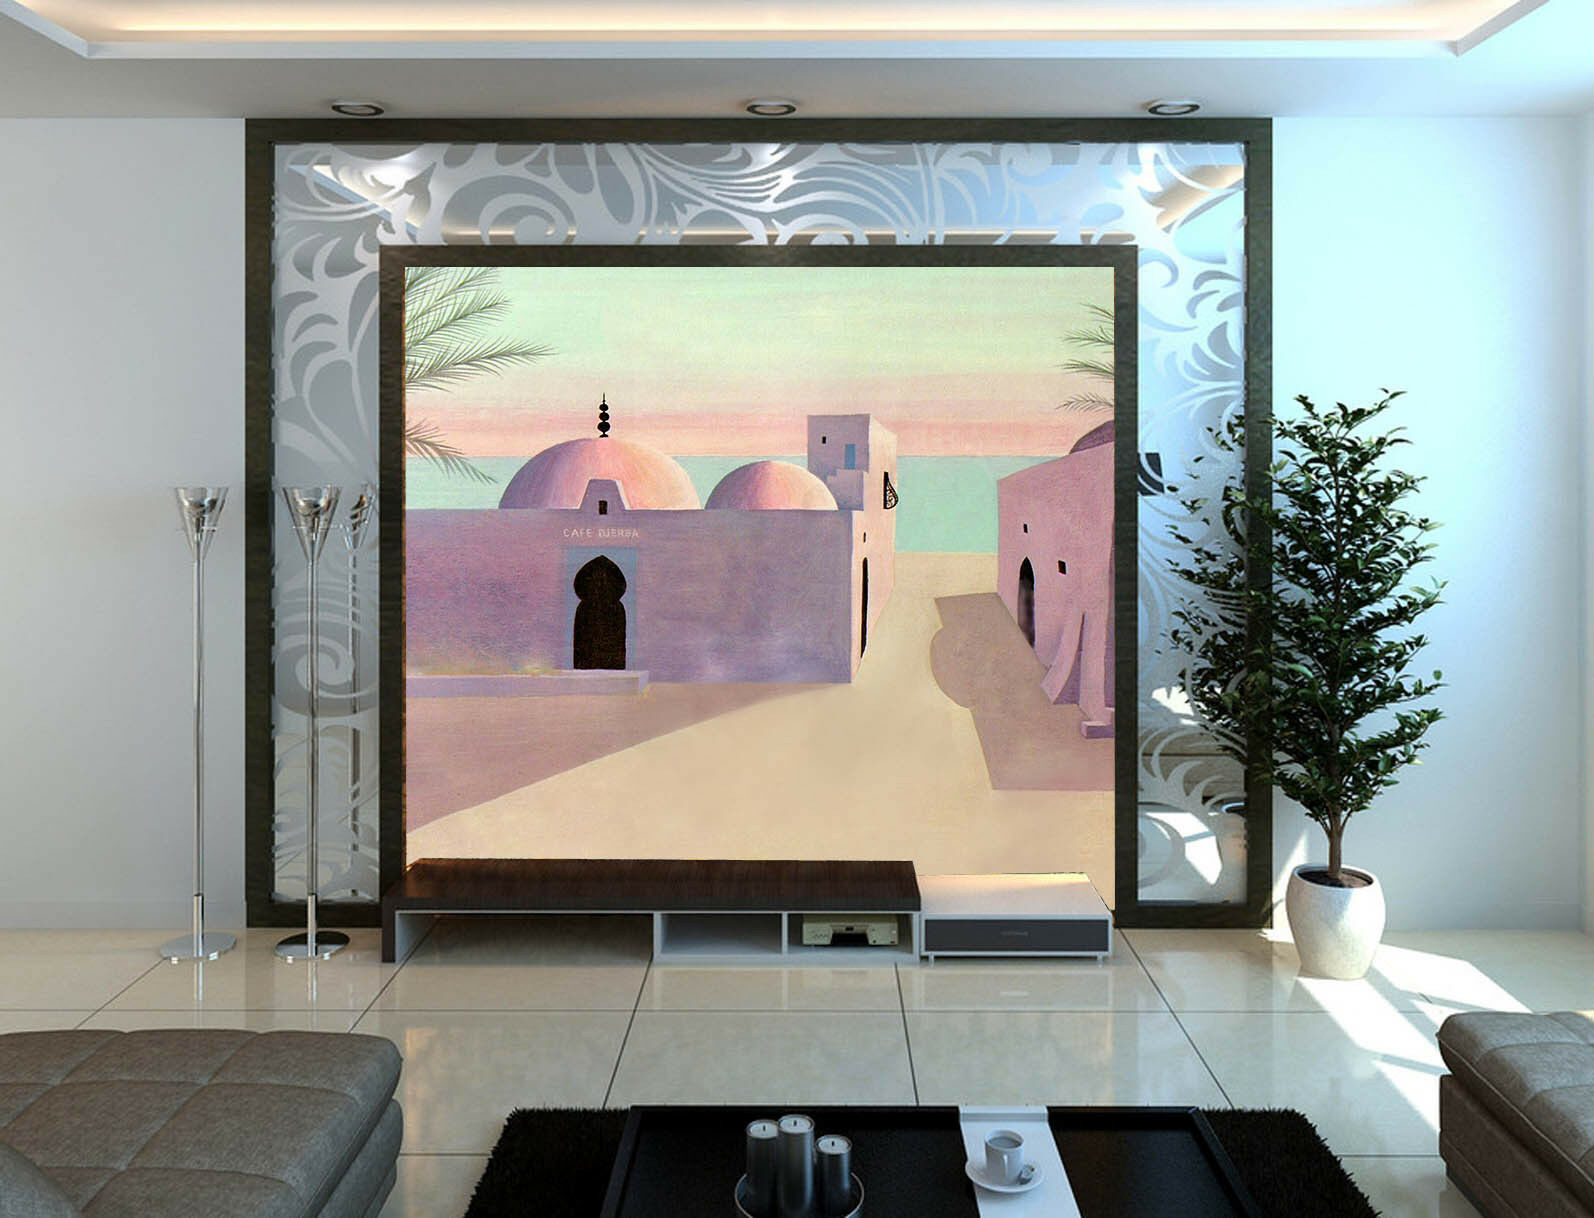 3D Burg der alten Zwerg 54 Fototapeten Wandbild Fototapete BildTapete Familie DE